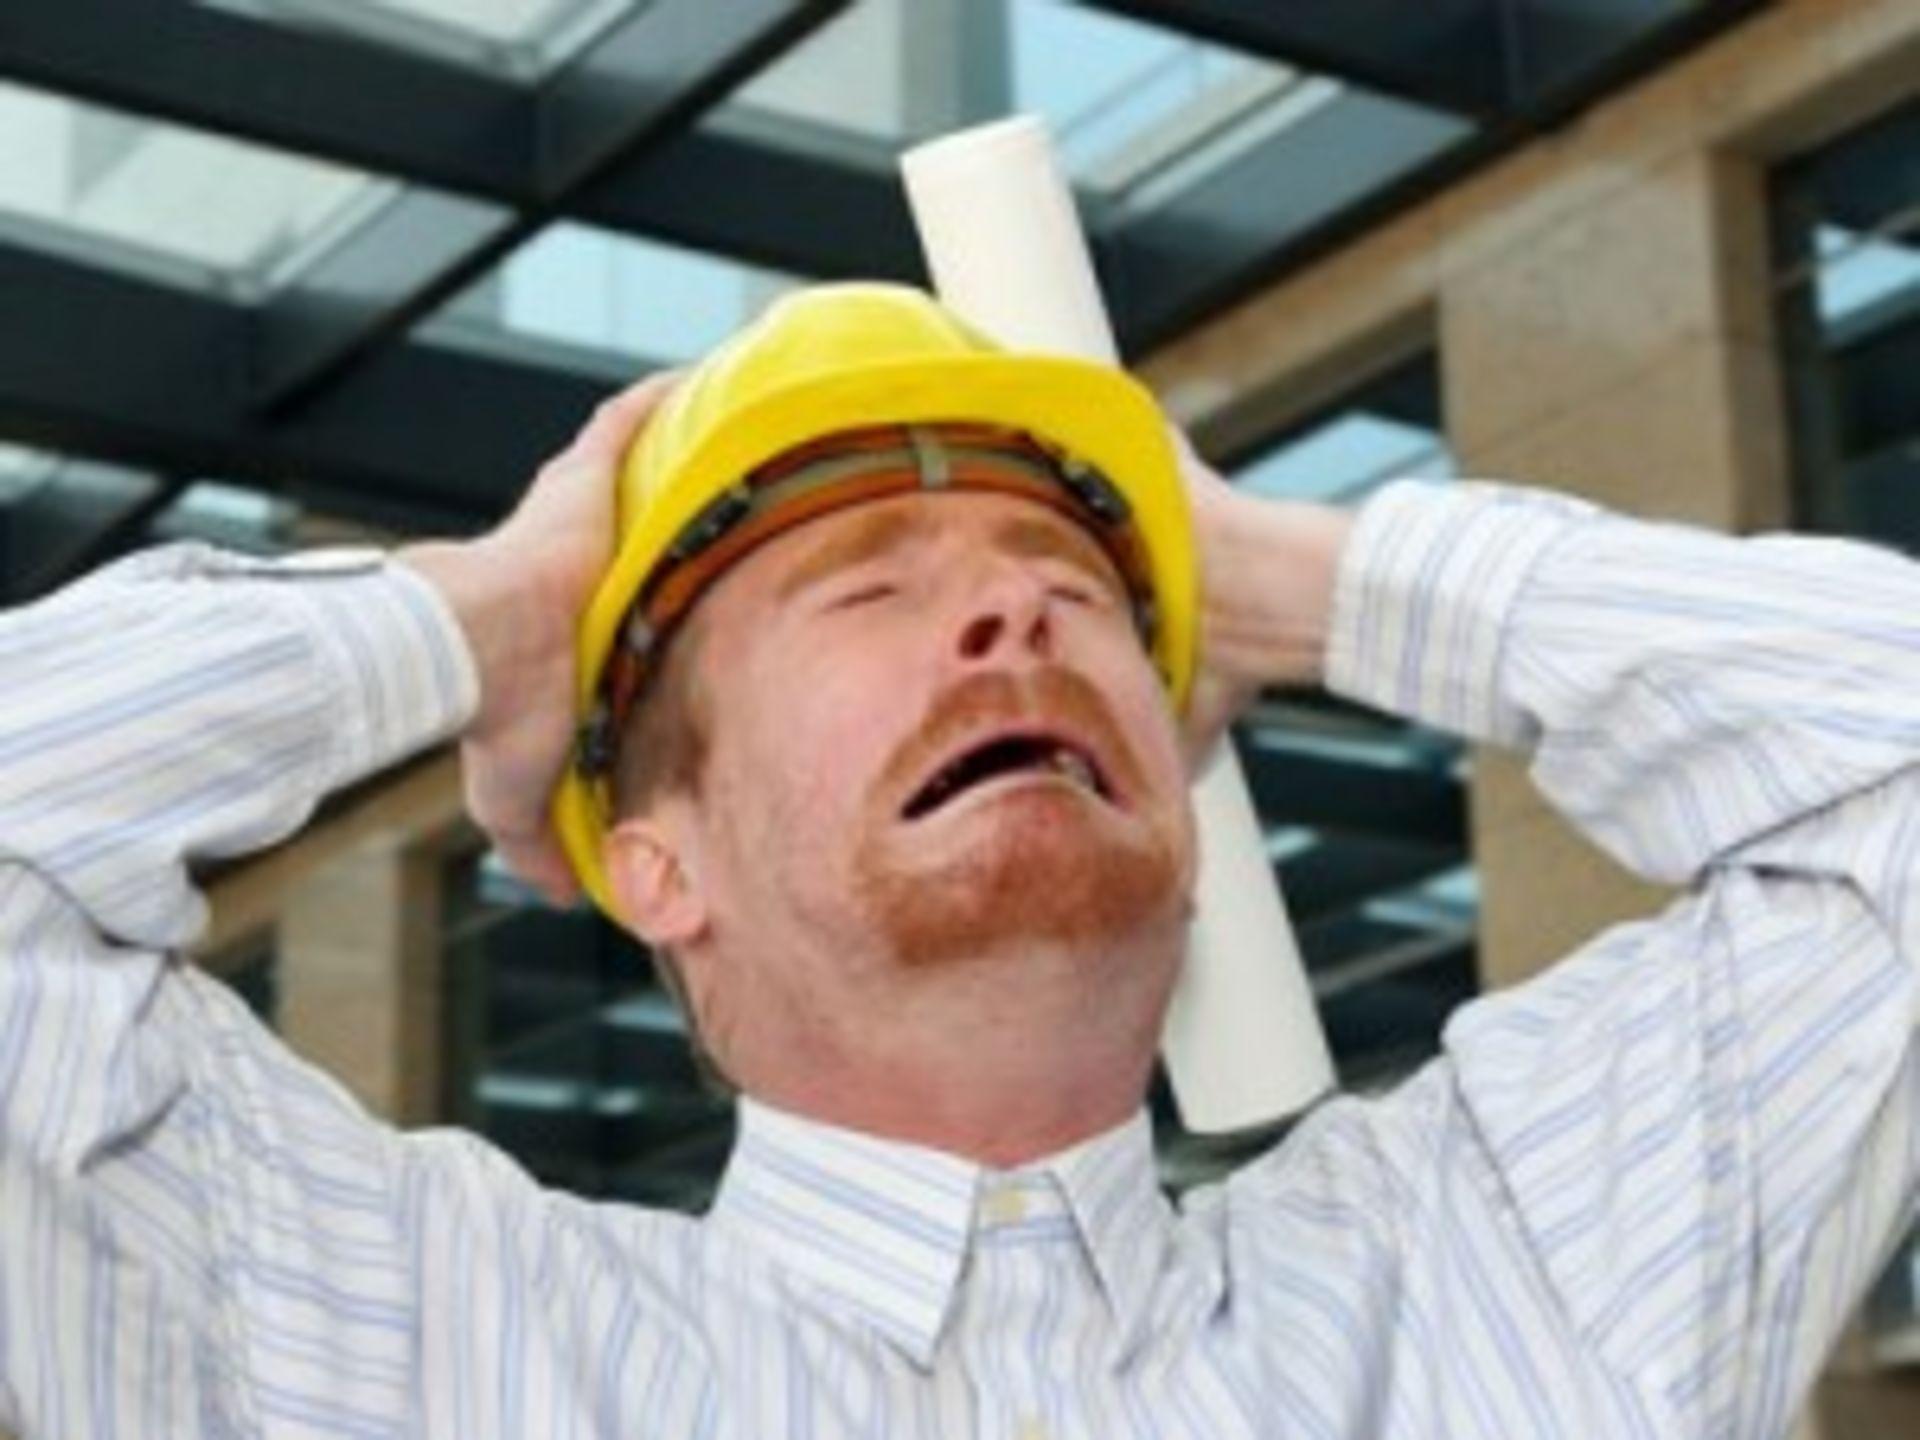 Reno 911: The Hidden Hazards of Homeownership